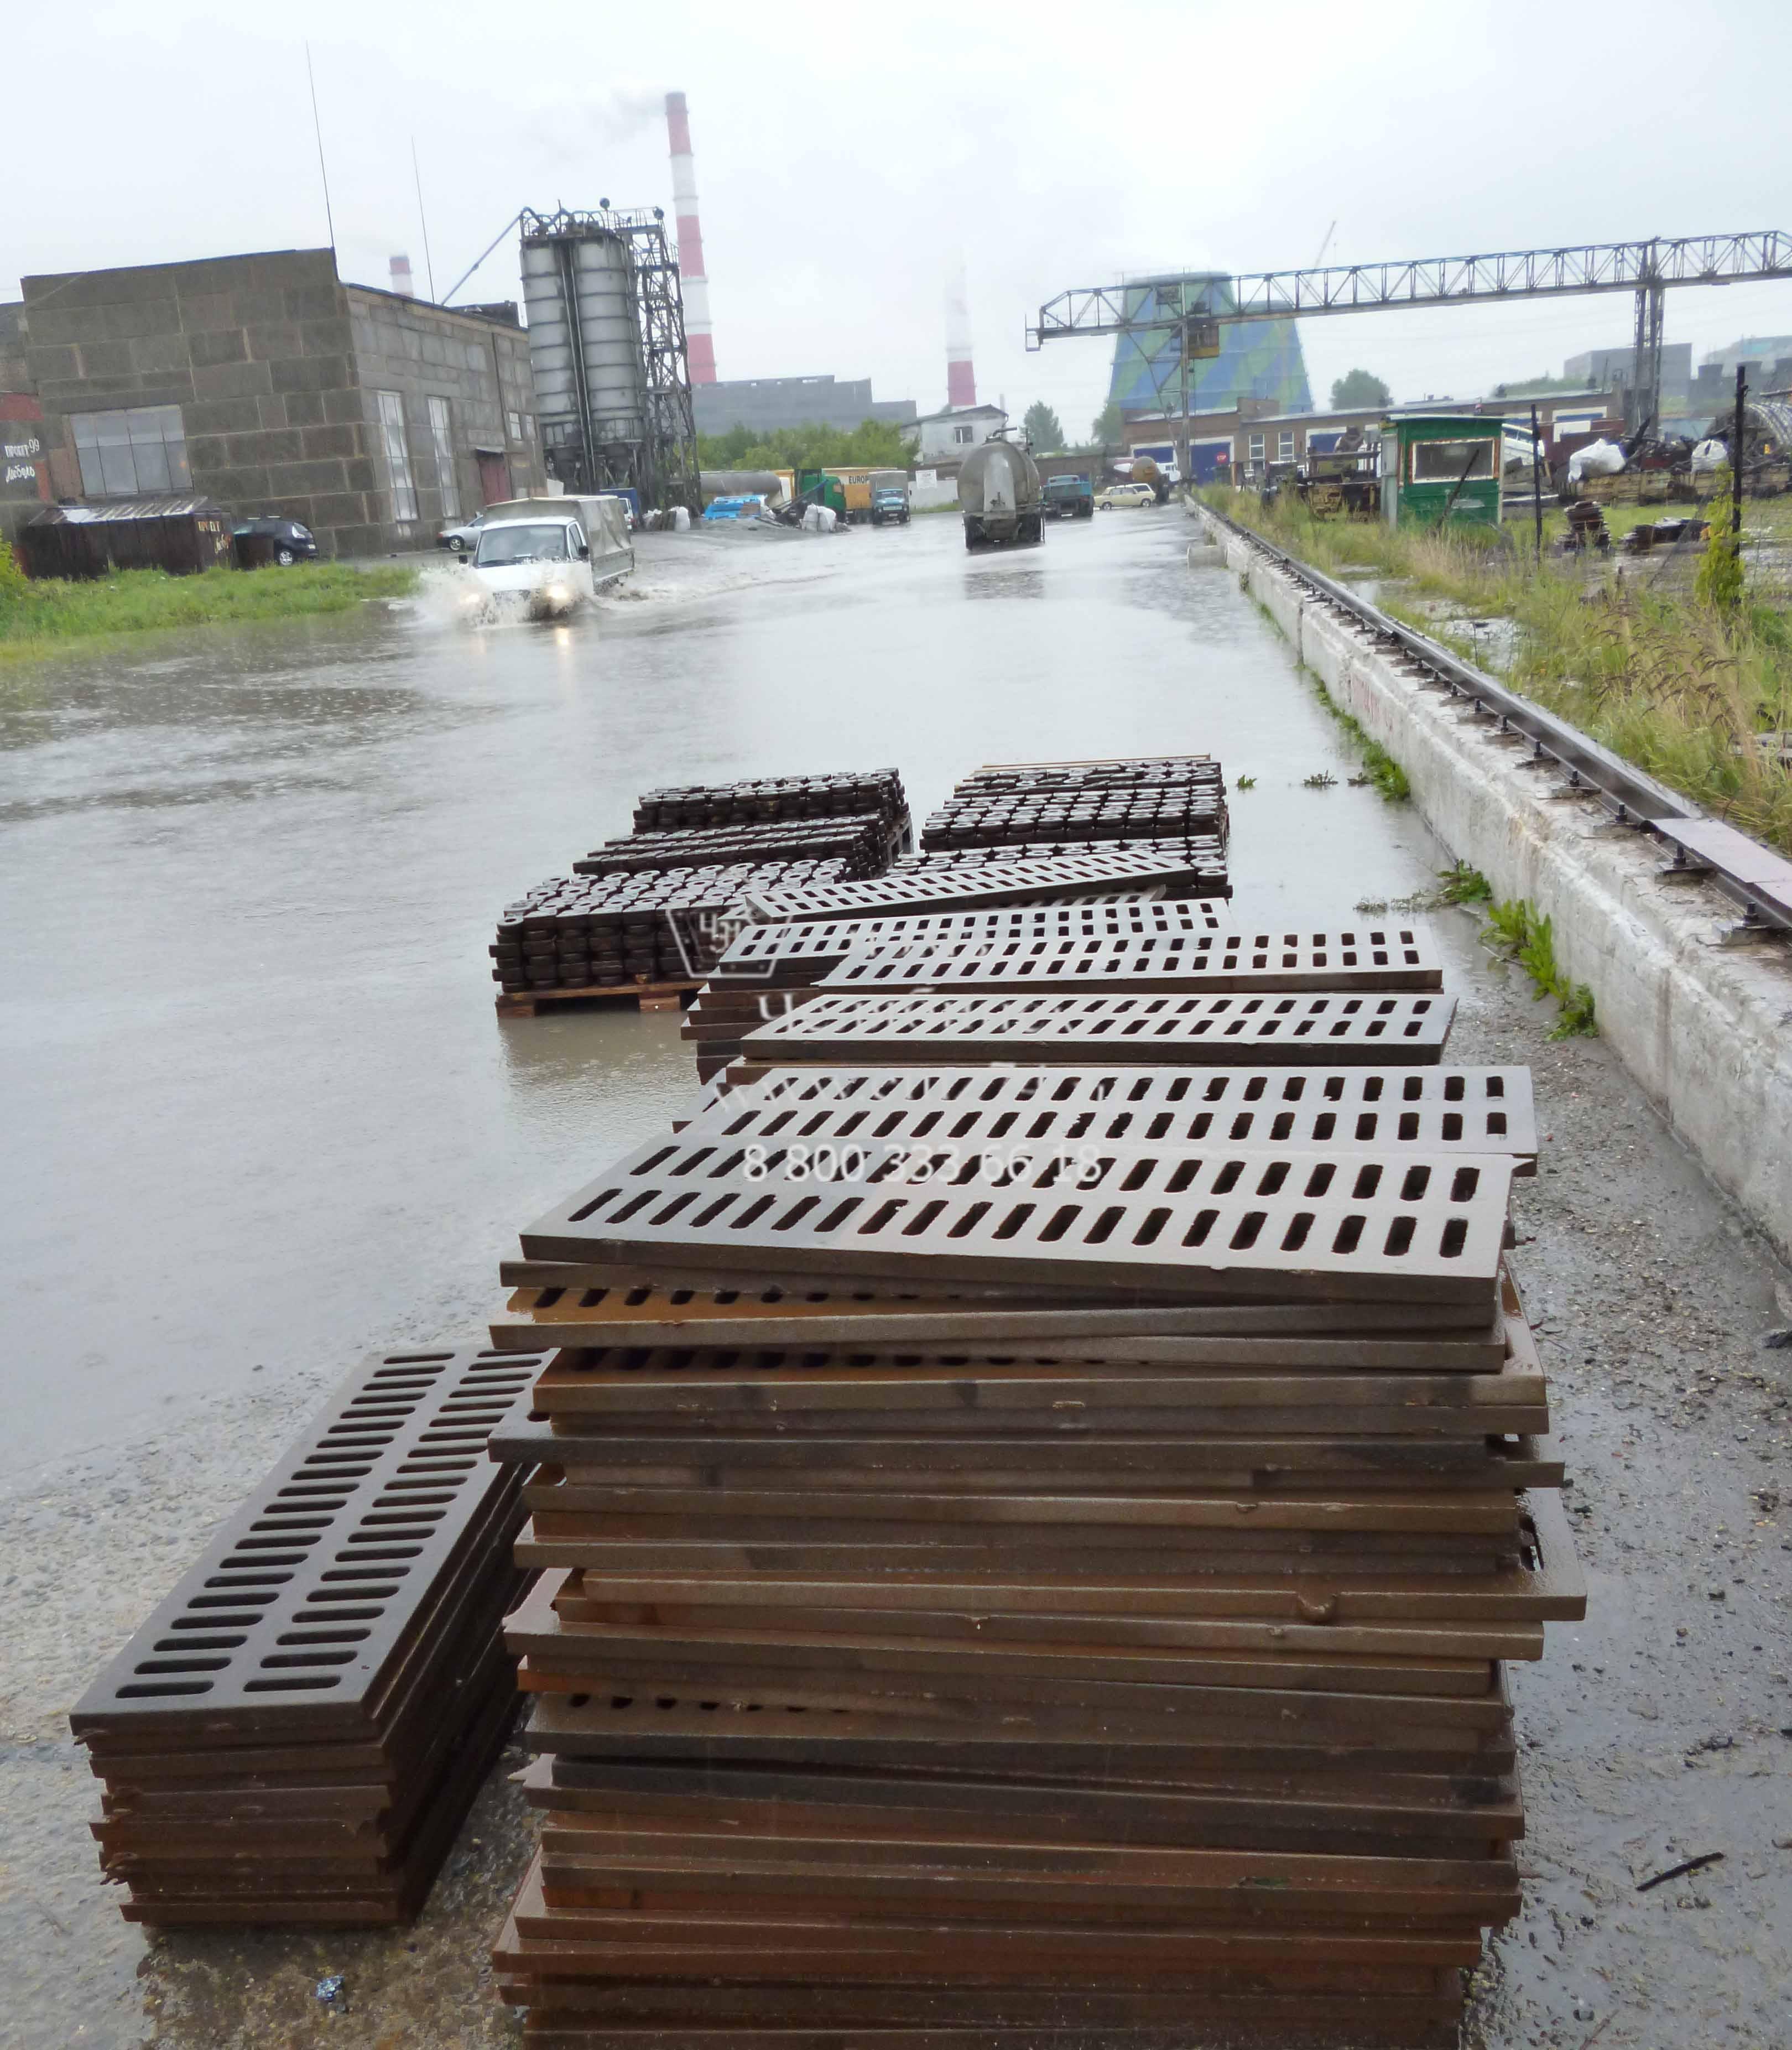 Производство ливневых решеток на заводе ЧЭМЗ